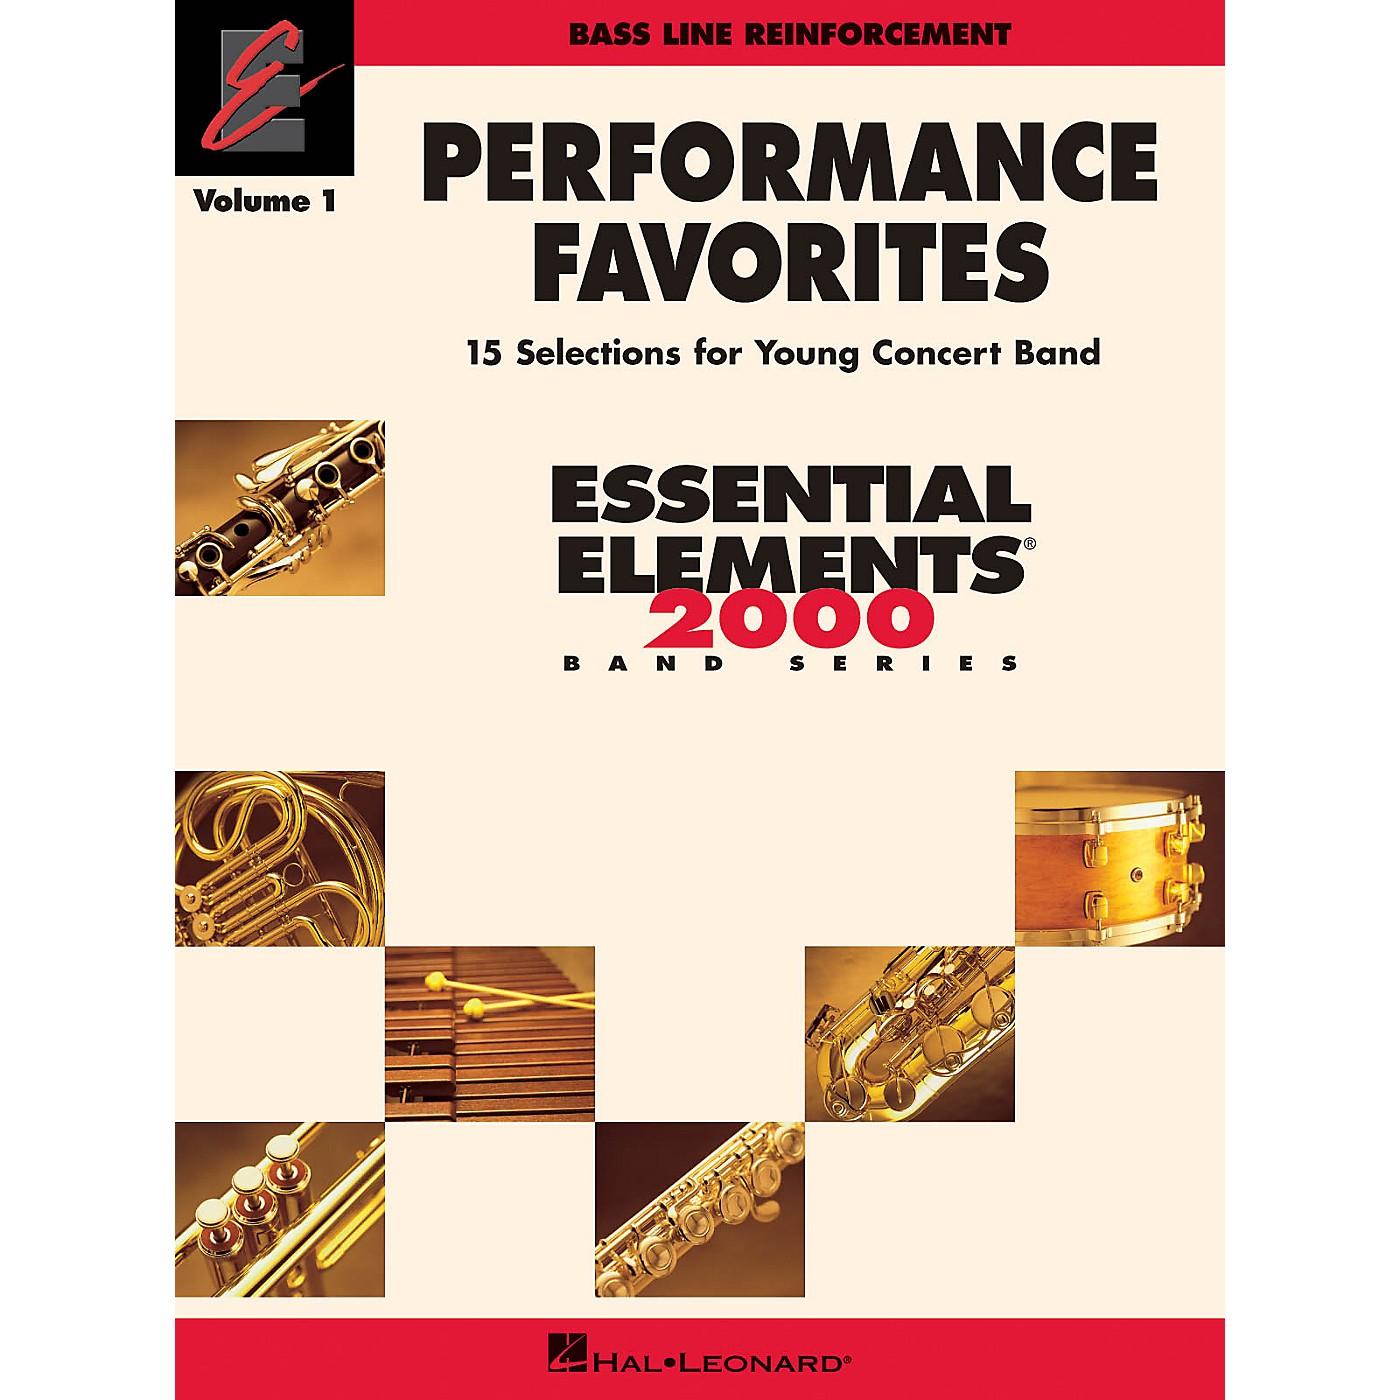 Hal Leonard Performance Favorites, Vol. 1 - Bass Line Reinforcement Concert Band Level 2 Composed by Various thumbnail